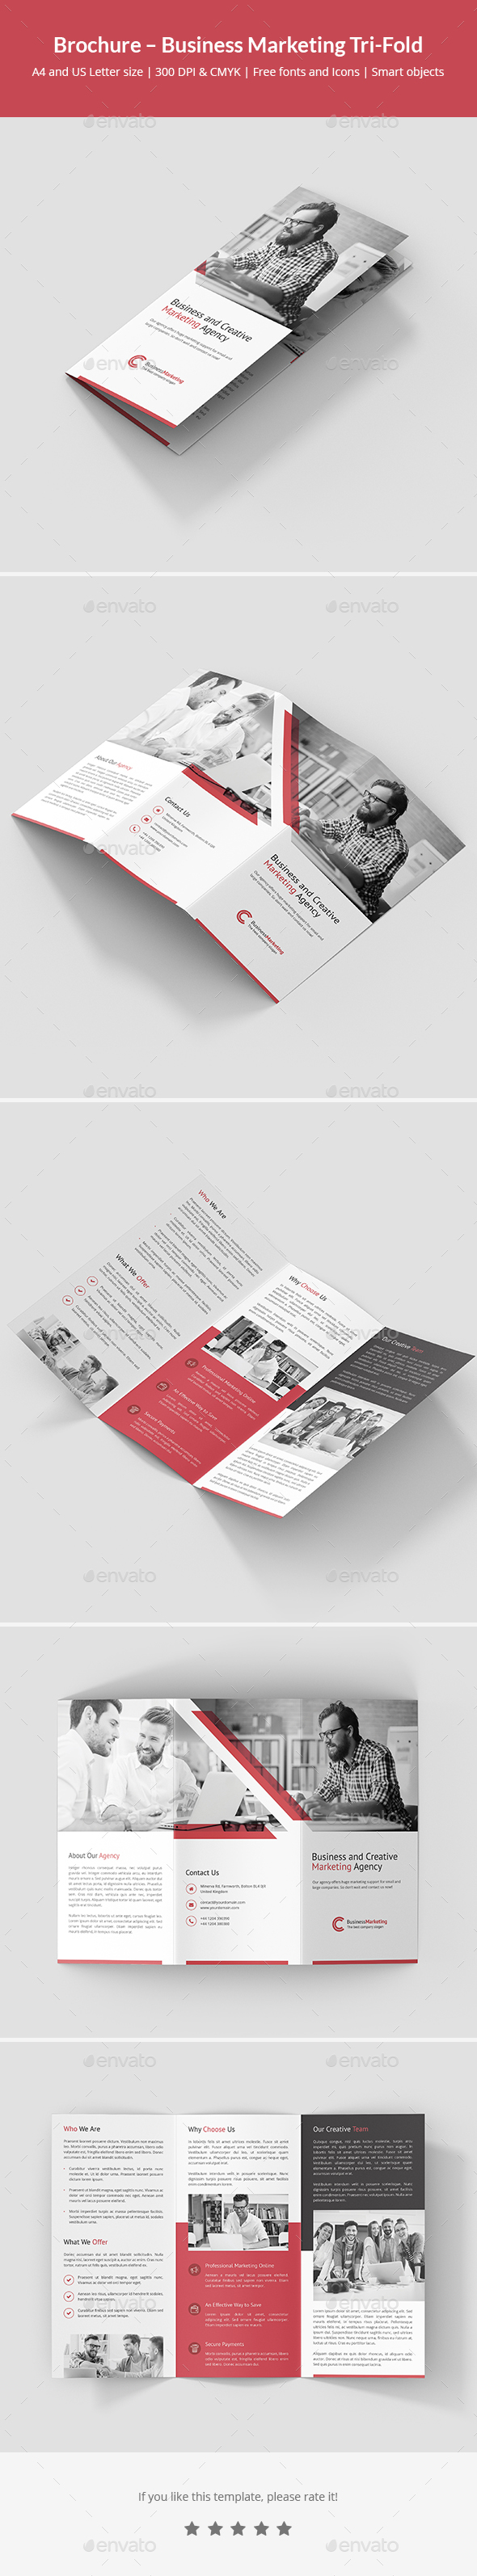 Brochure – Business Marketing Tri-Fold - Corporate Brochures